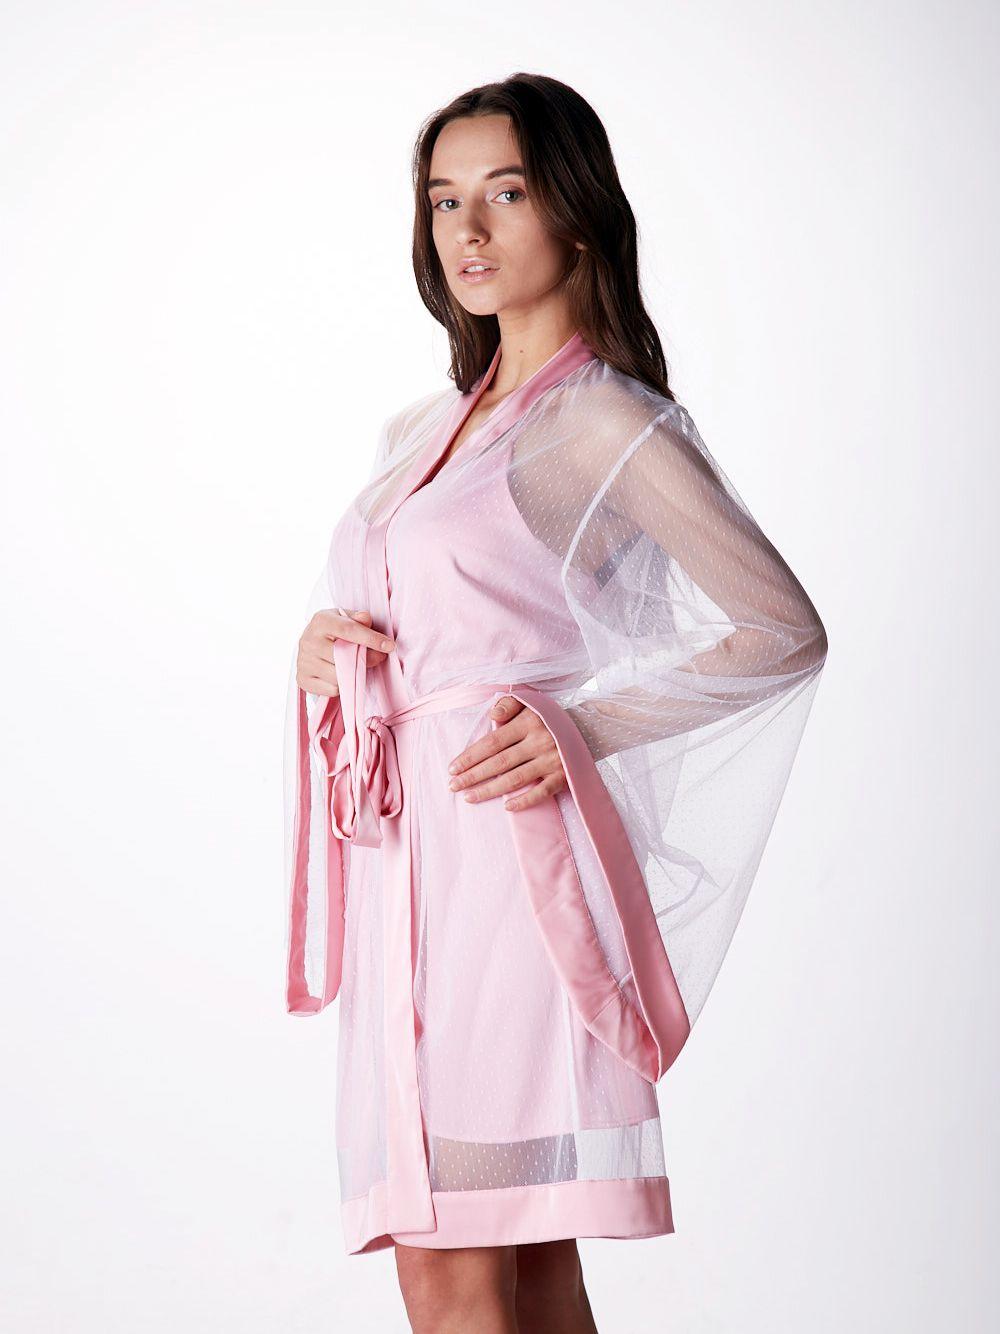 Sleepwear for woman sleepwear nightgown Bridesmaid pajama Chemise Silk clothing Bachelorette party pajama Pink silk slip